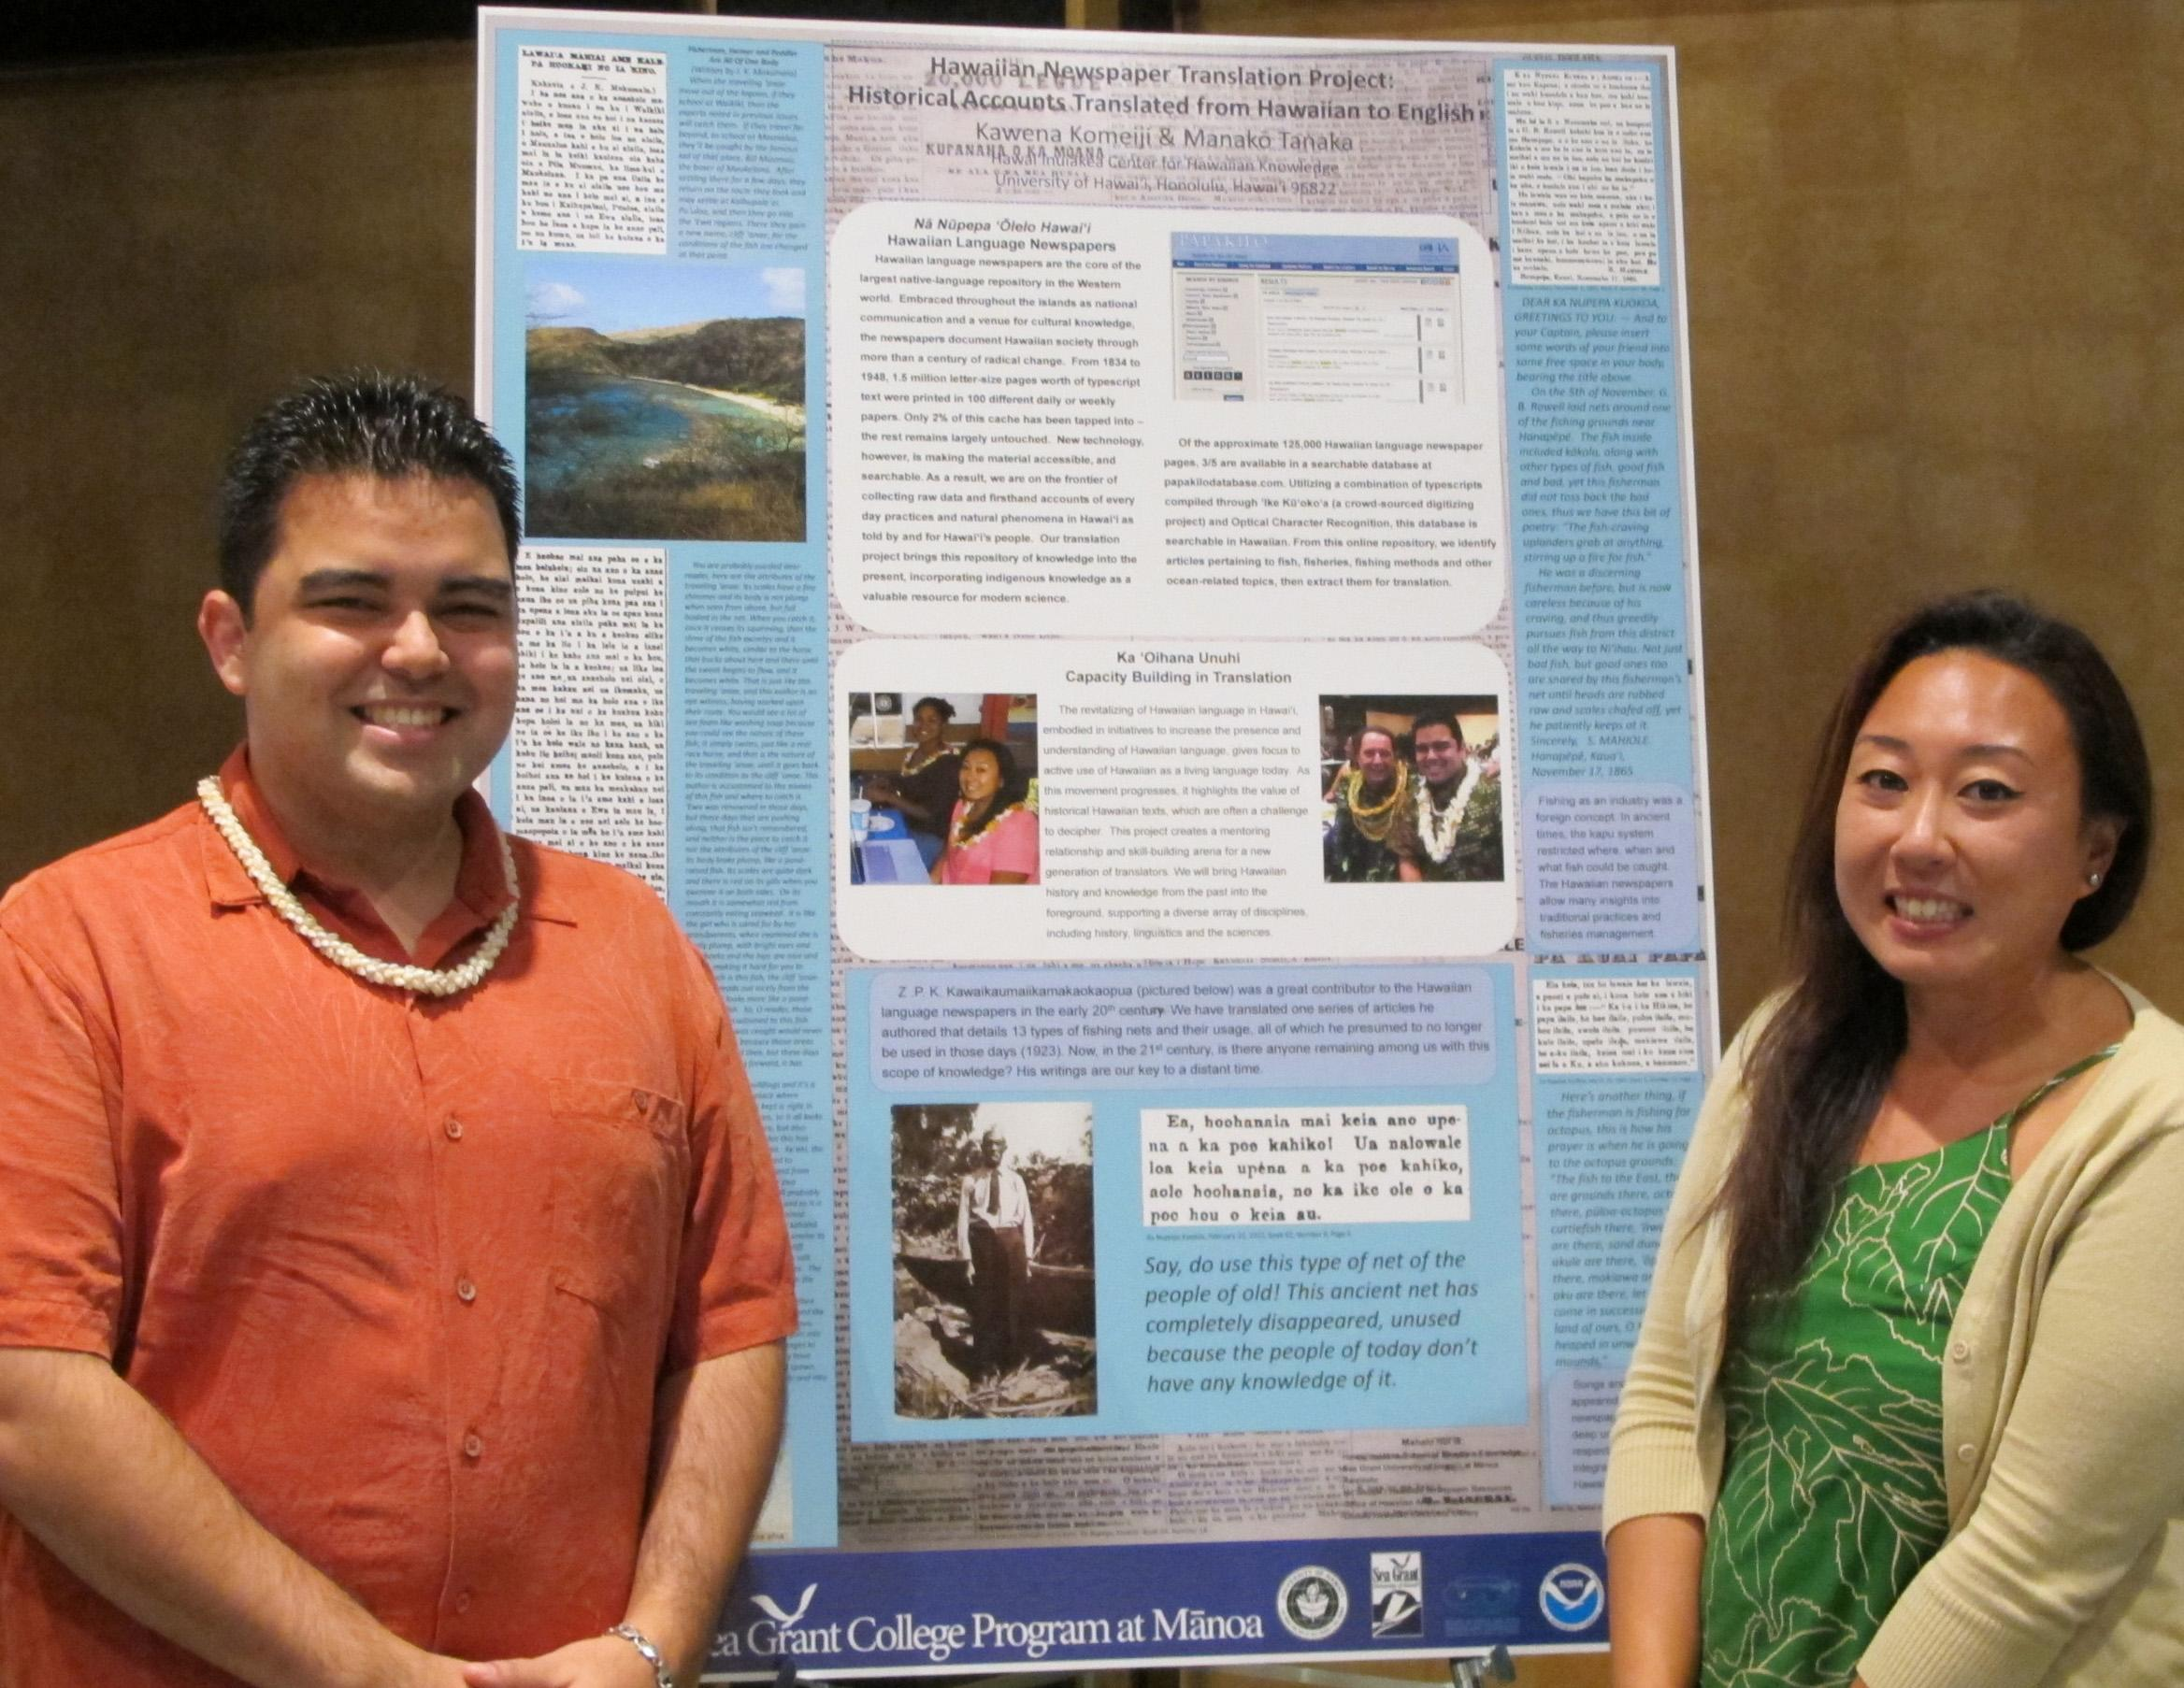 Photo Credit: University of Hawai'i